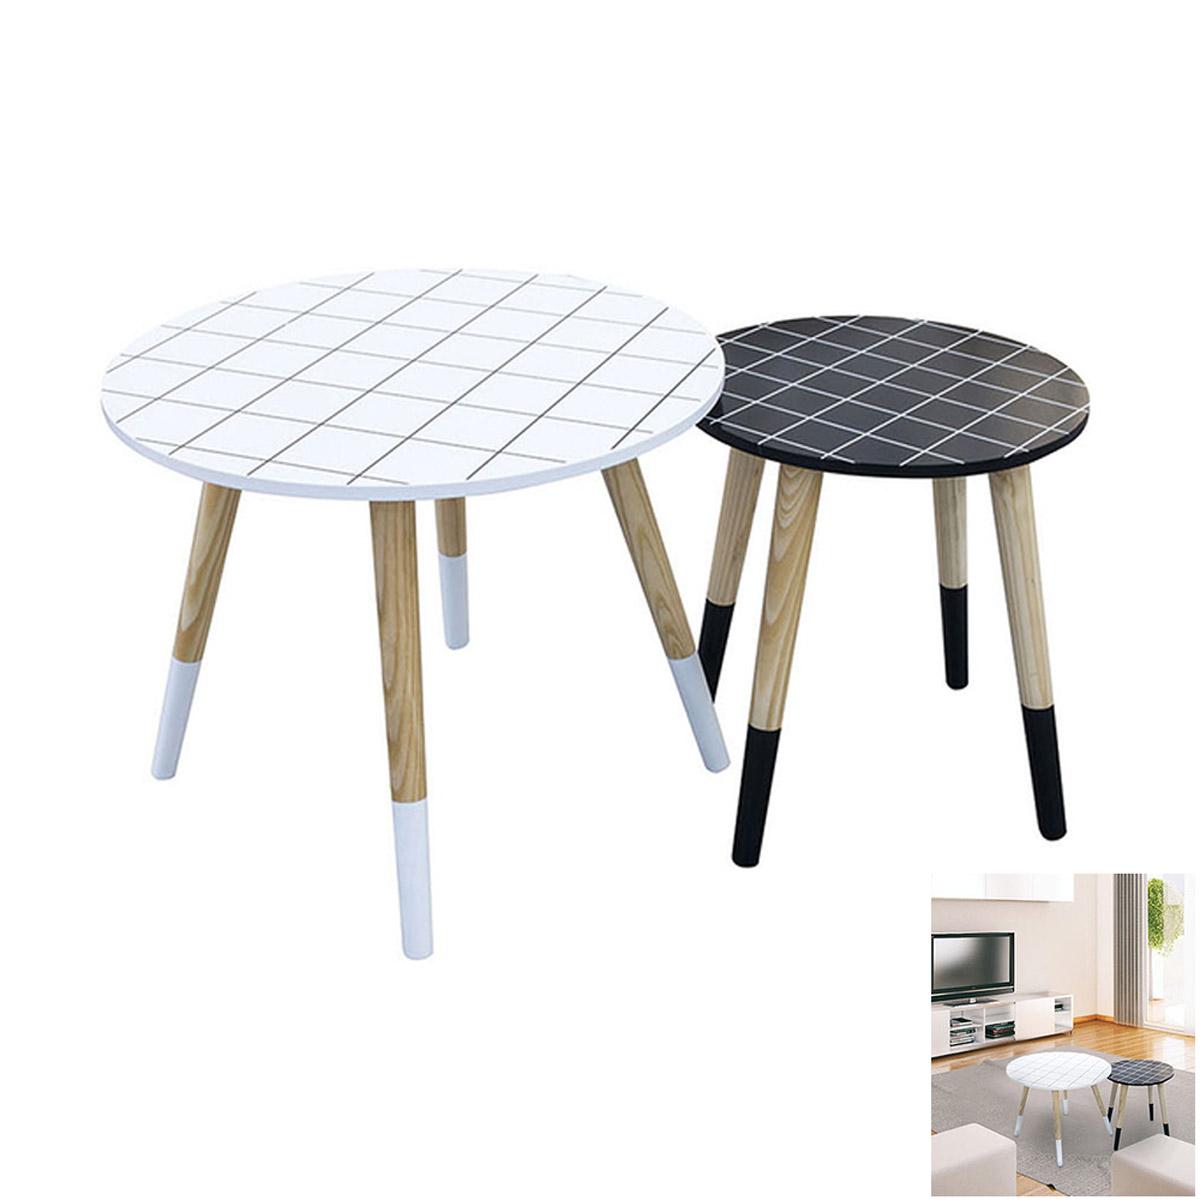 2 tables gigognes bois \'Boho\' noir blanc - 48 et 33 cm - [R2399]